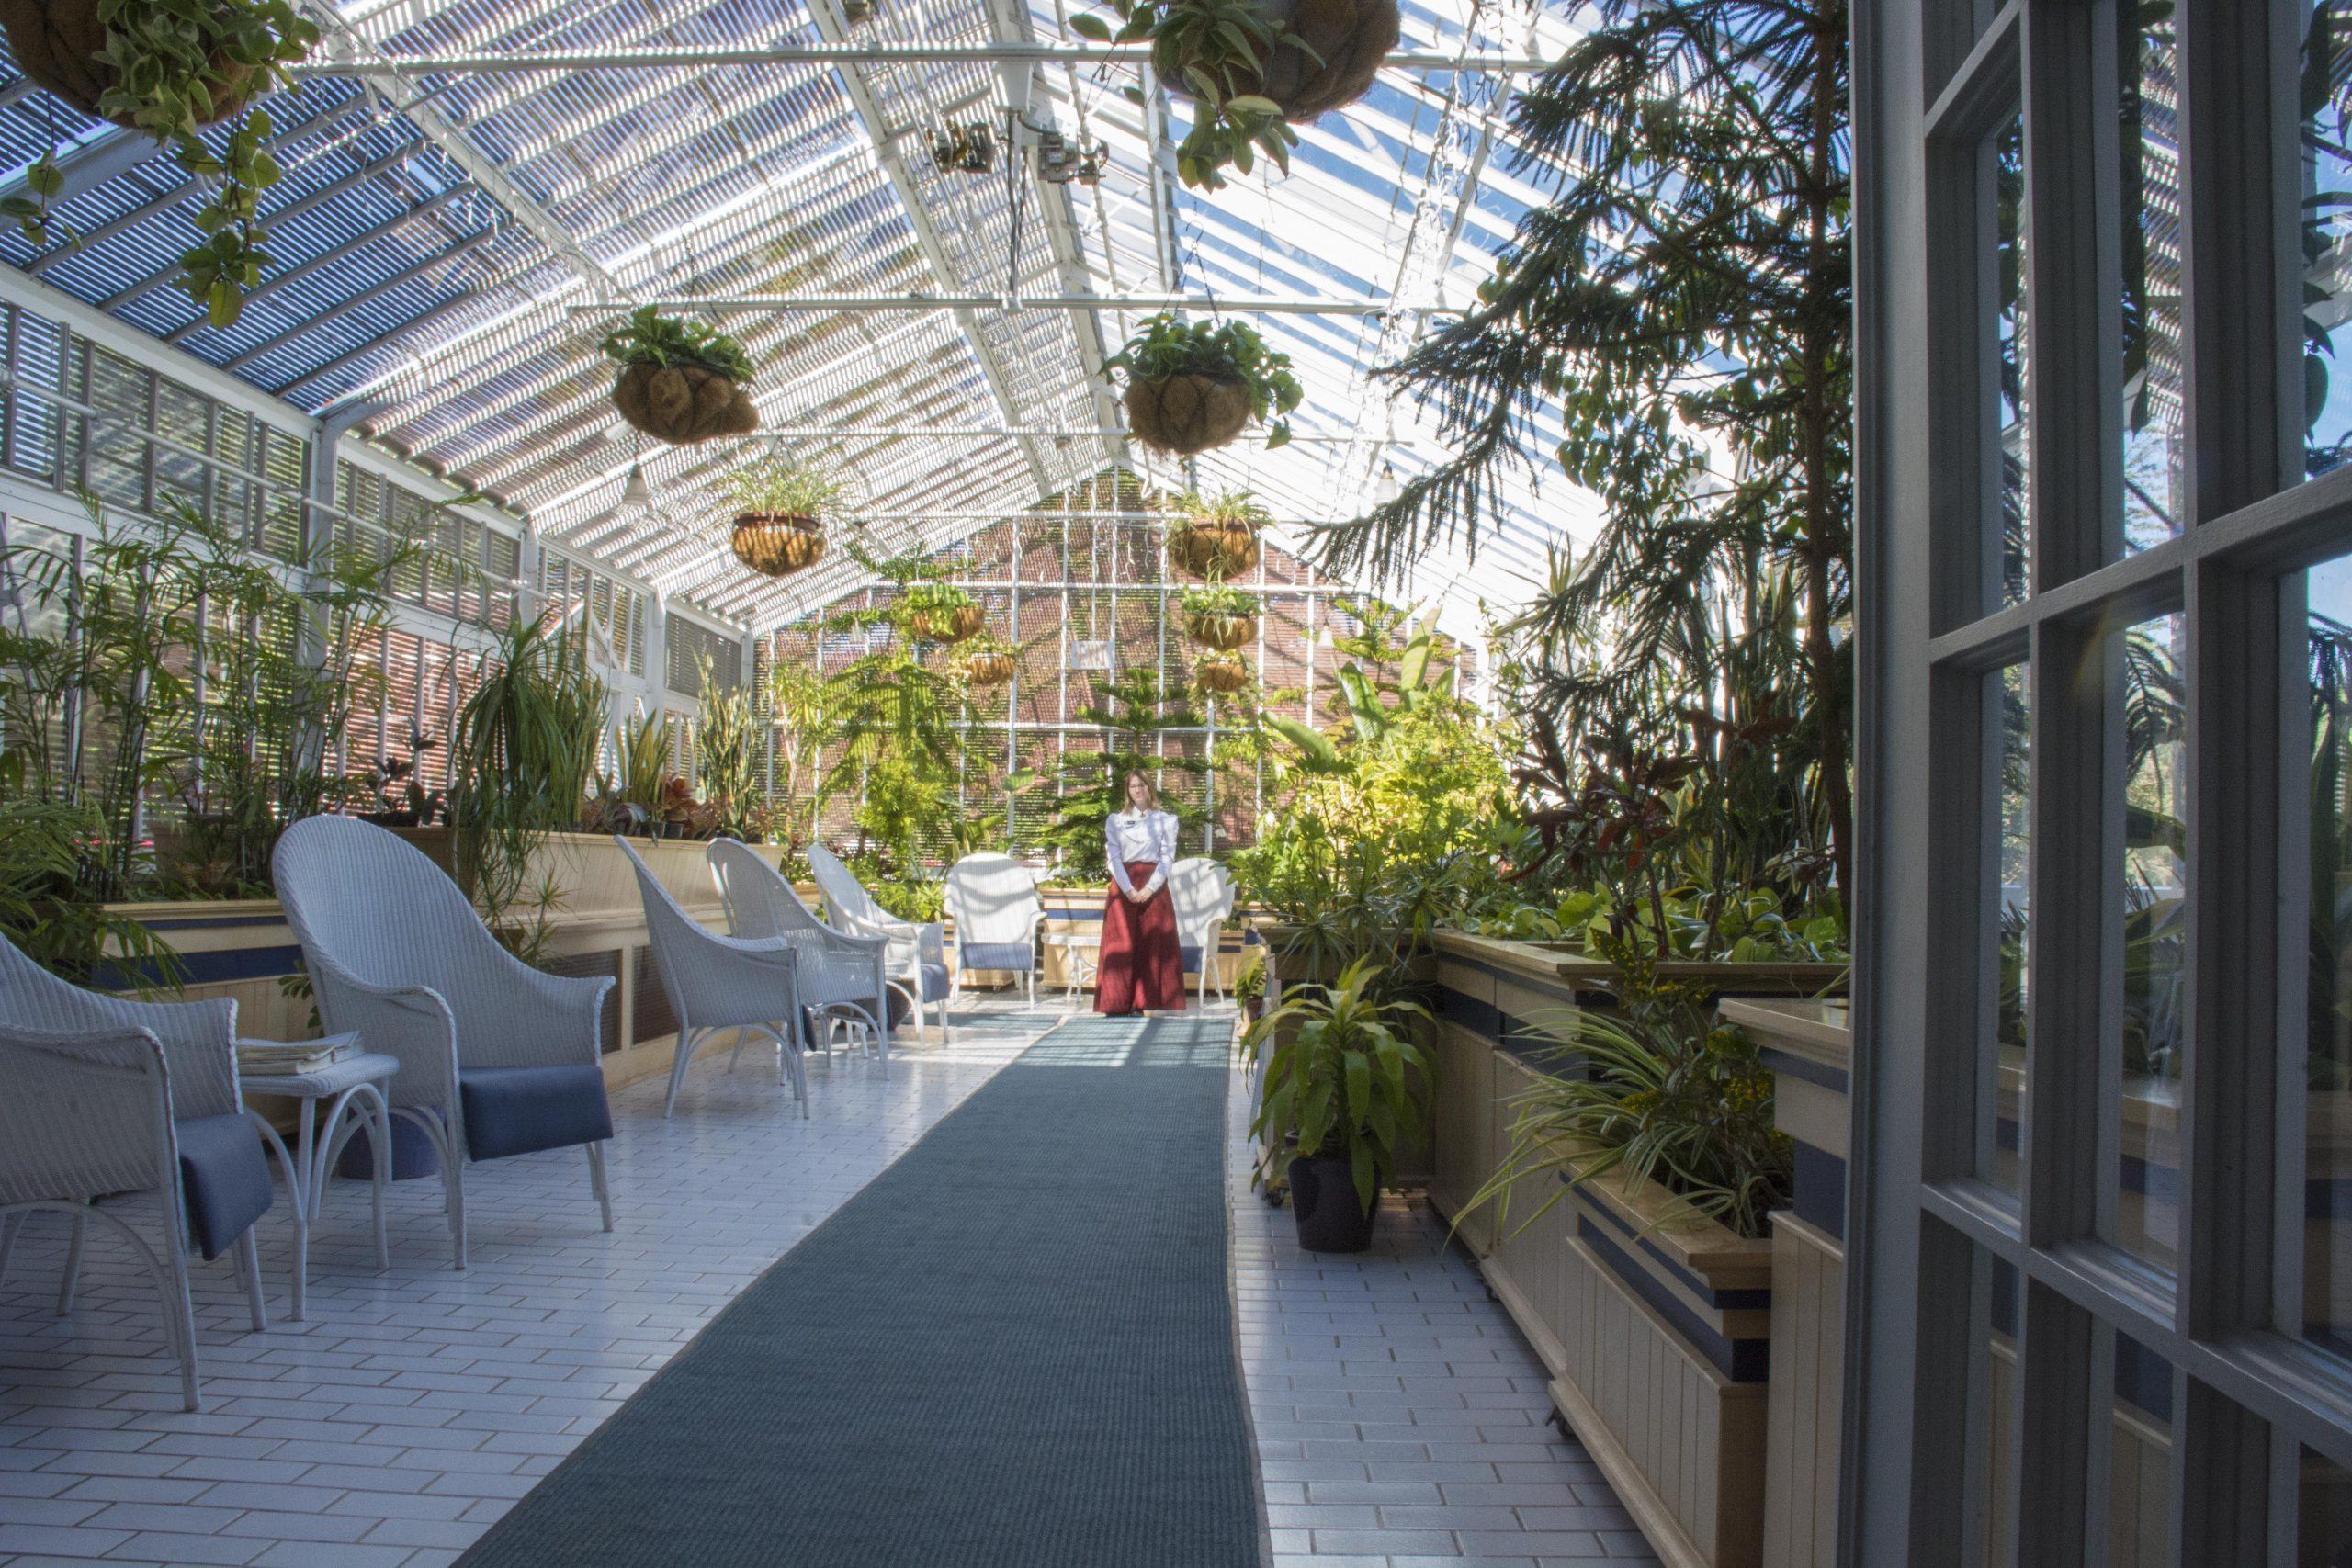 Government House Conservatory Botanical Garden